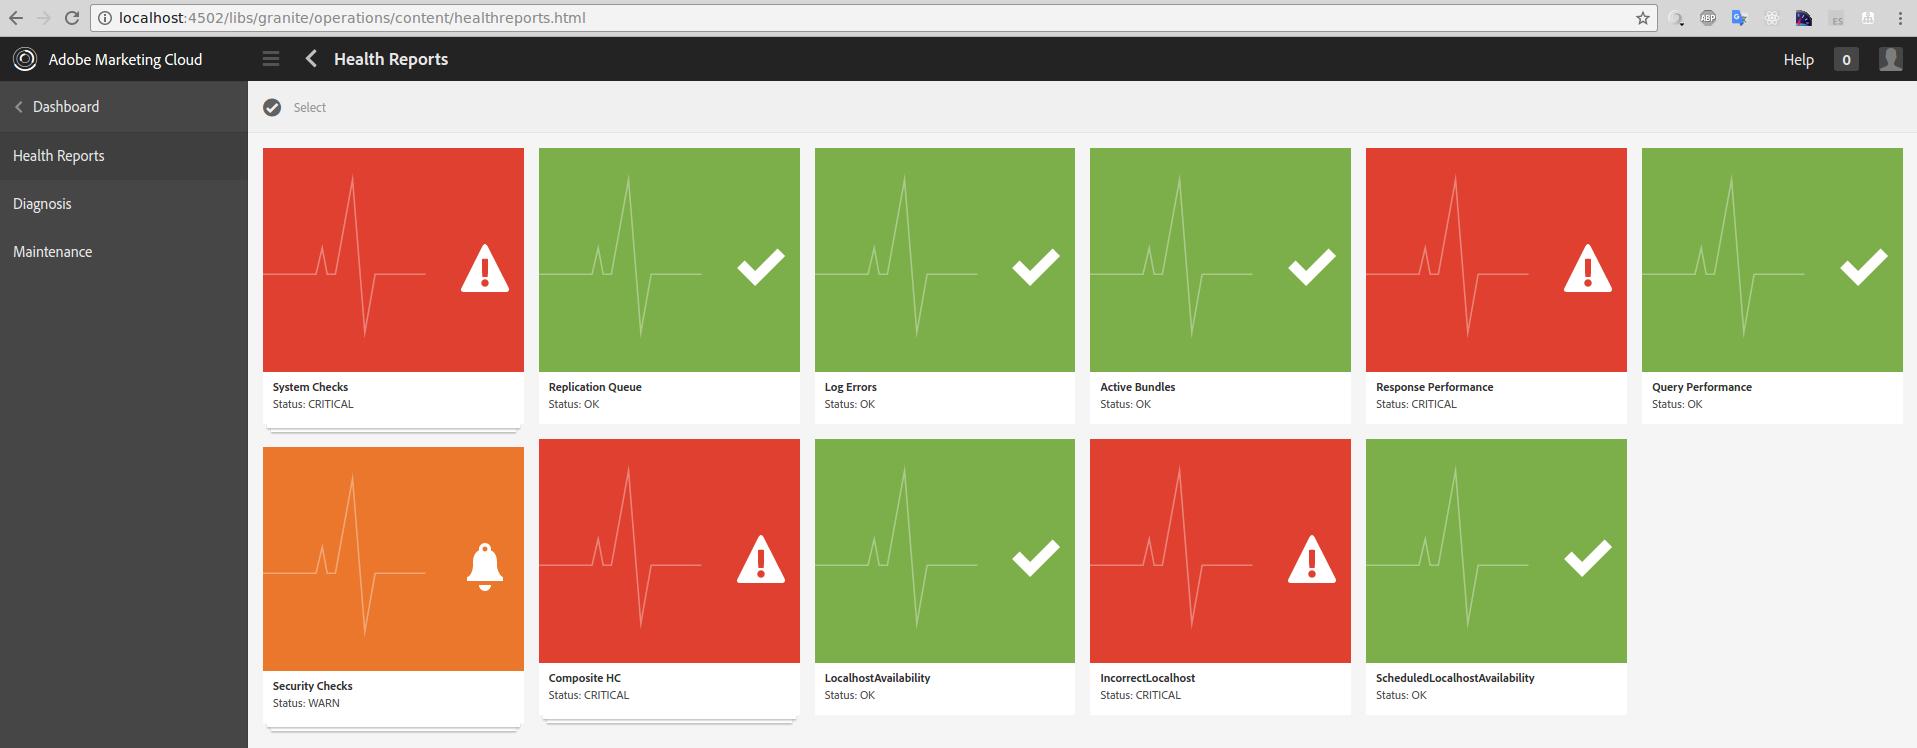 The Logic behind Dashboard Tool Diagnosis